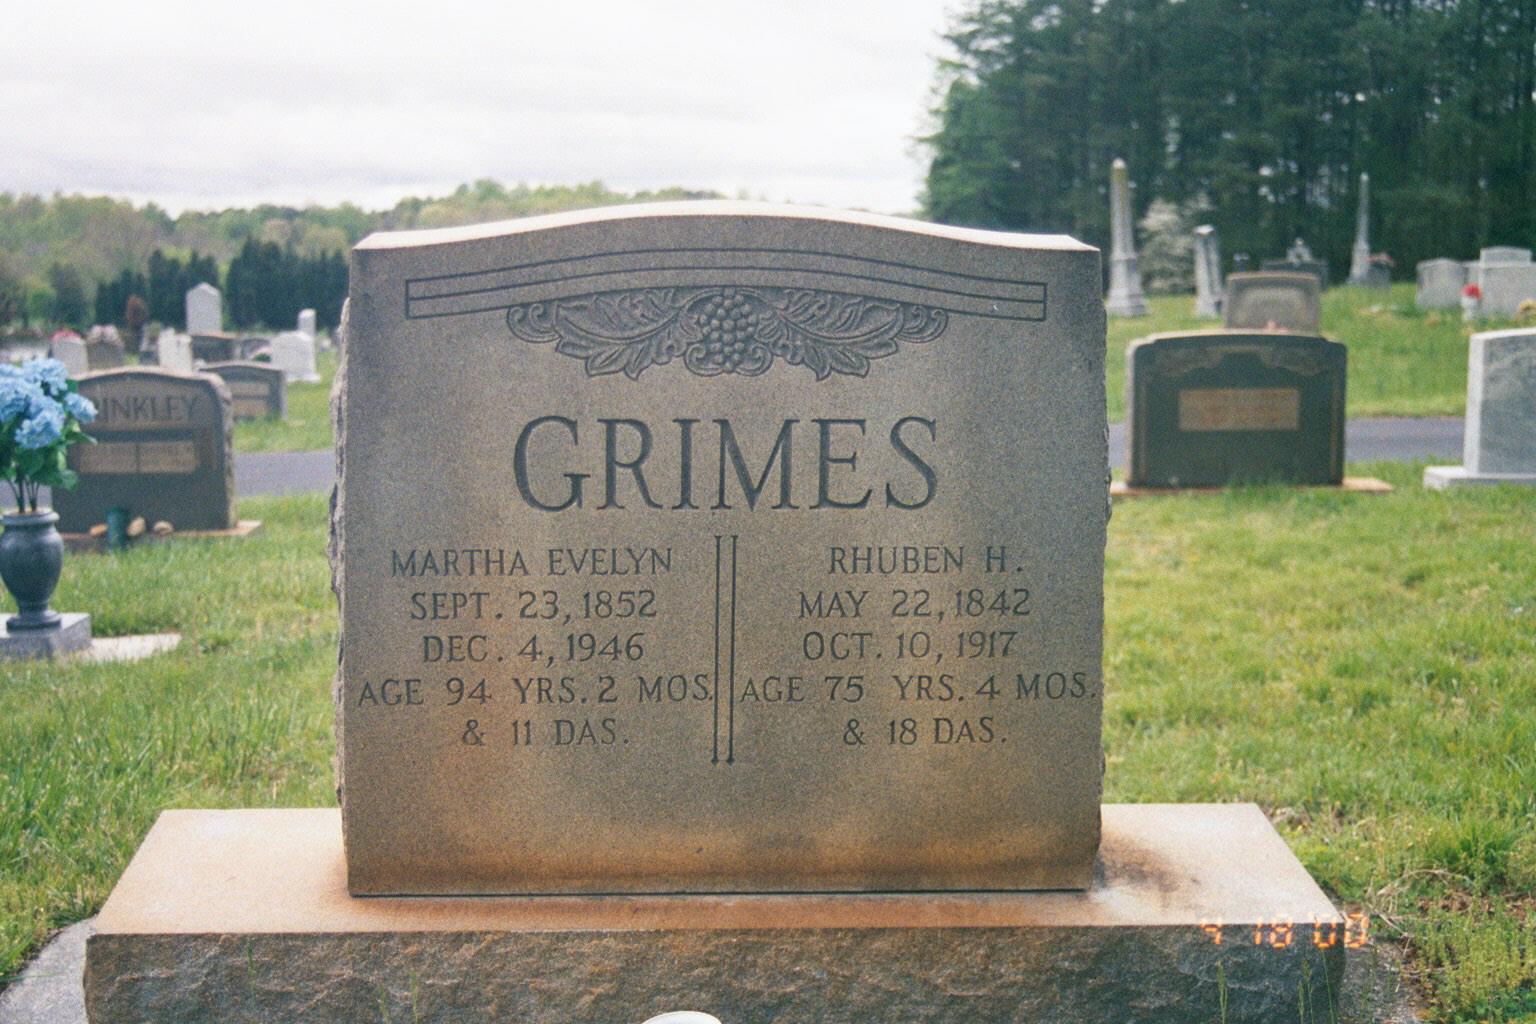 Harrison Boone Grimes